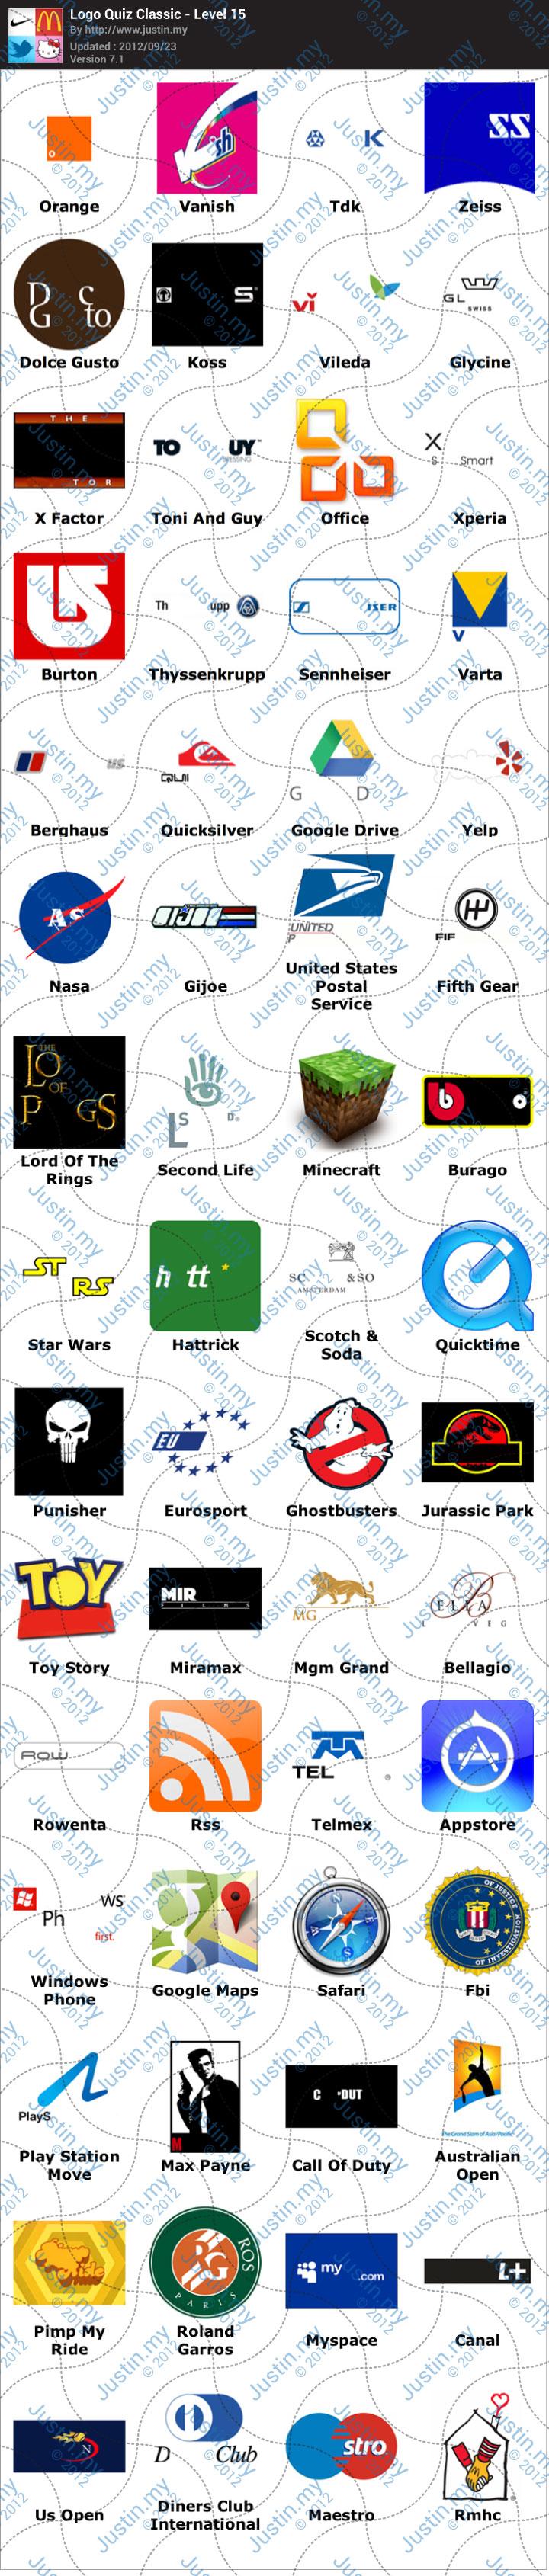 logo quiz soluzioni livelli 11 12 13 14 15 android